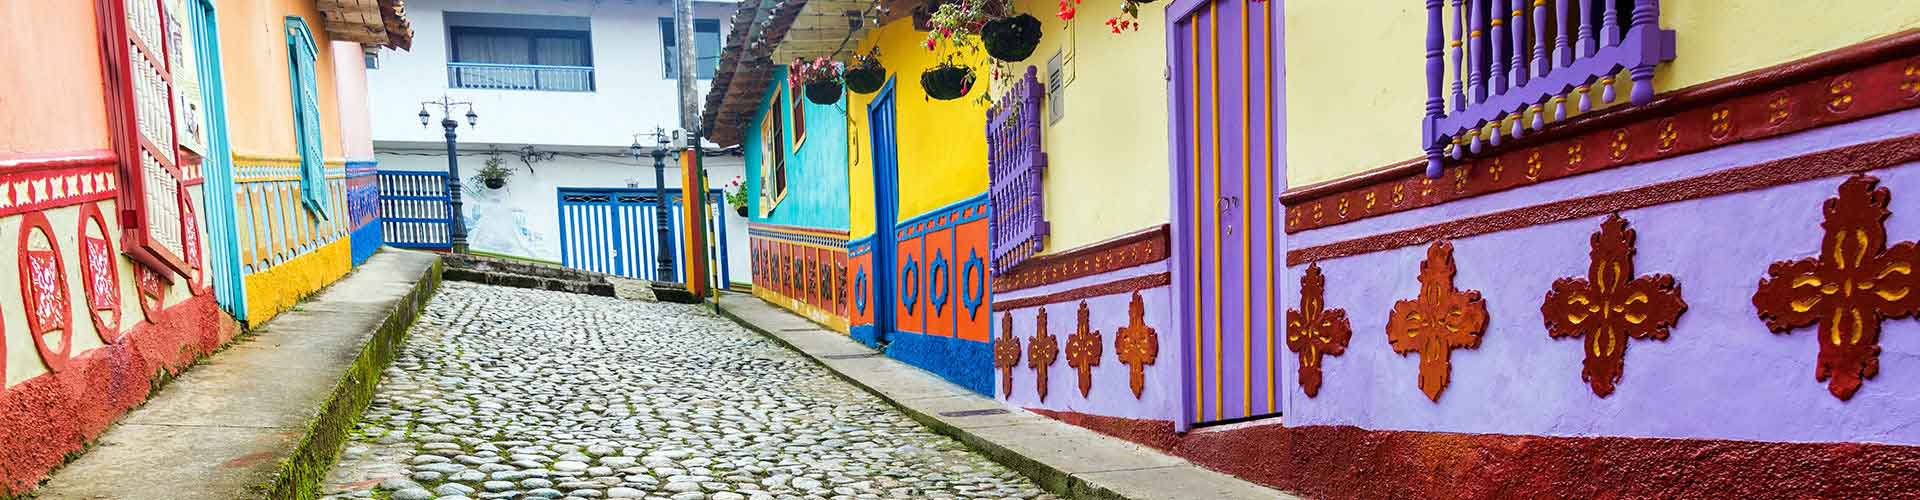 Medellín – Hostellit kohteessa Medellín. Medellín -karttoja, valokuvia ja arvosteluja kaikista Medellín -hostelleista.